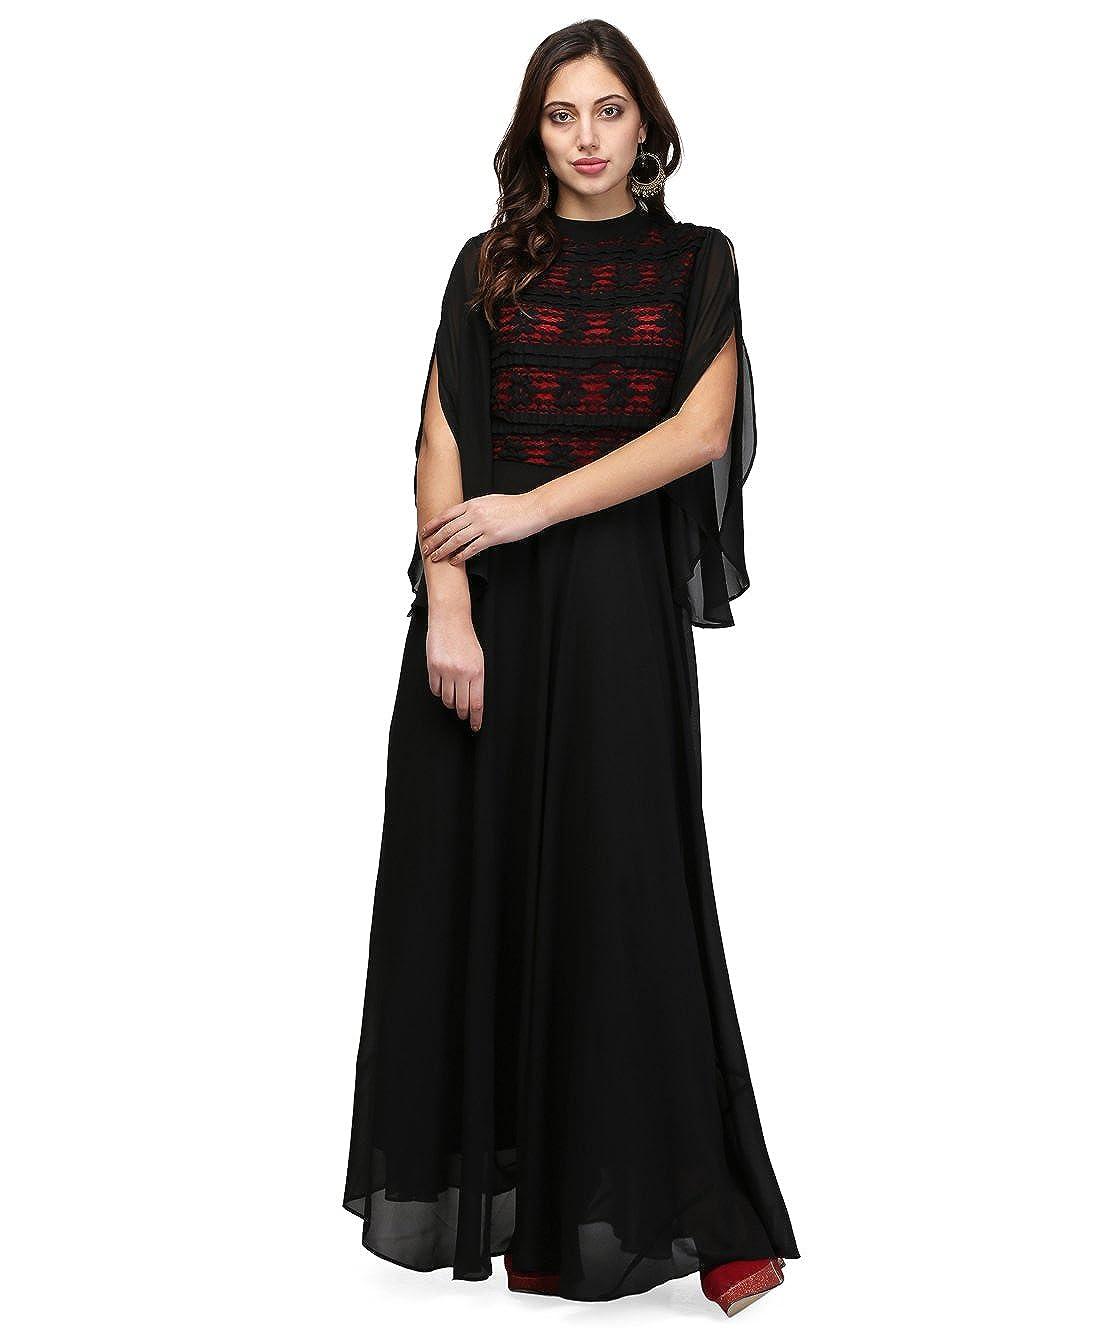 Buy V\u0026M Black-Red Women's Contrast Lace